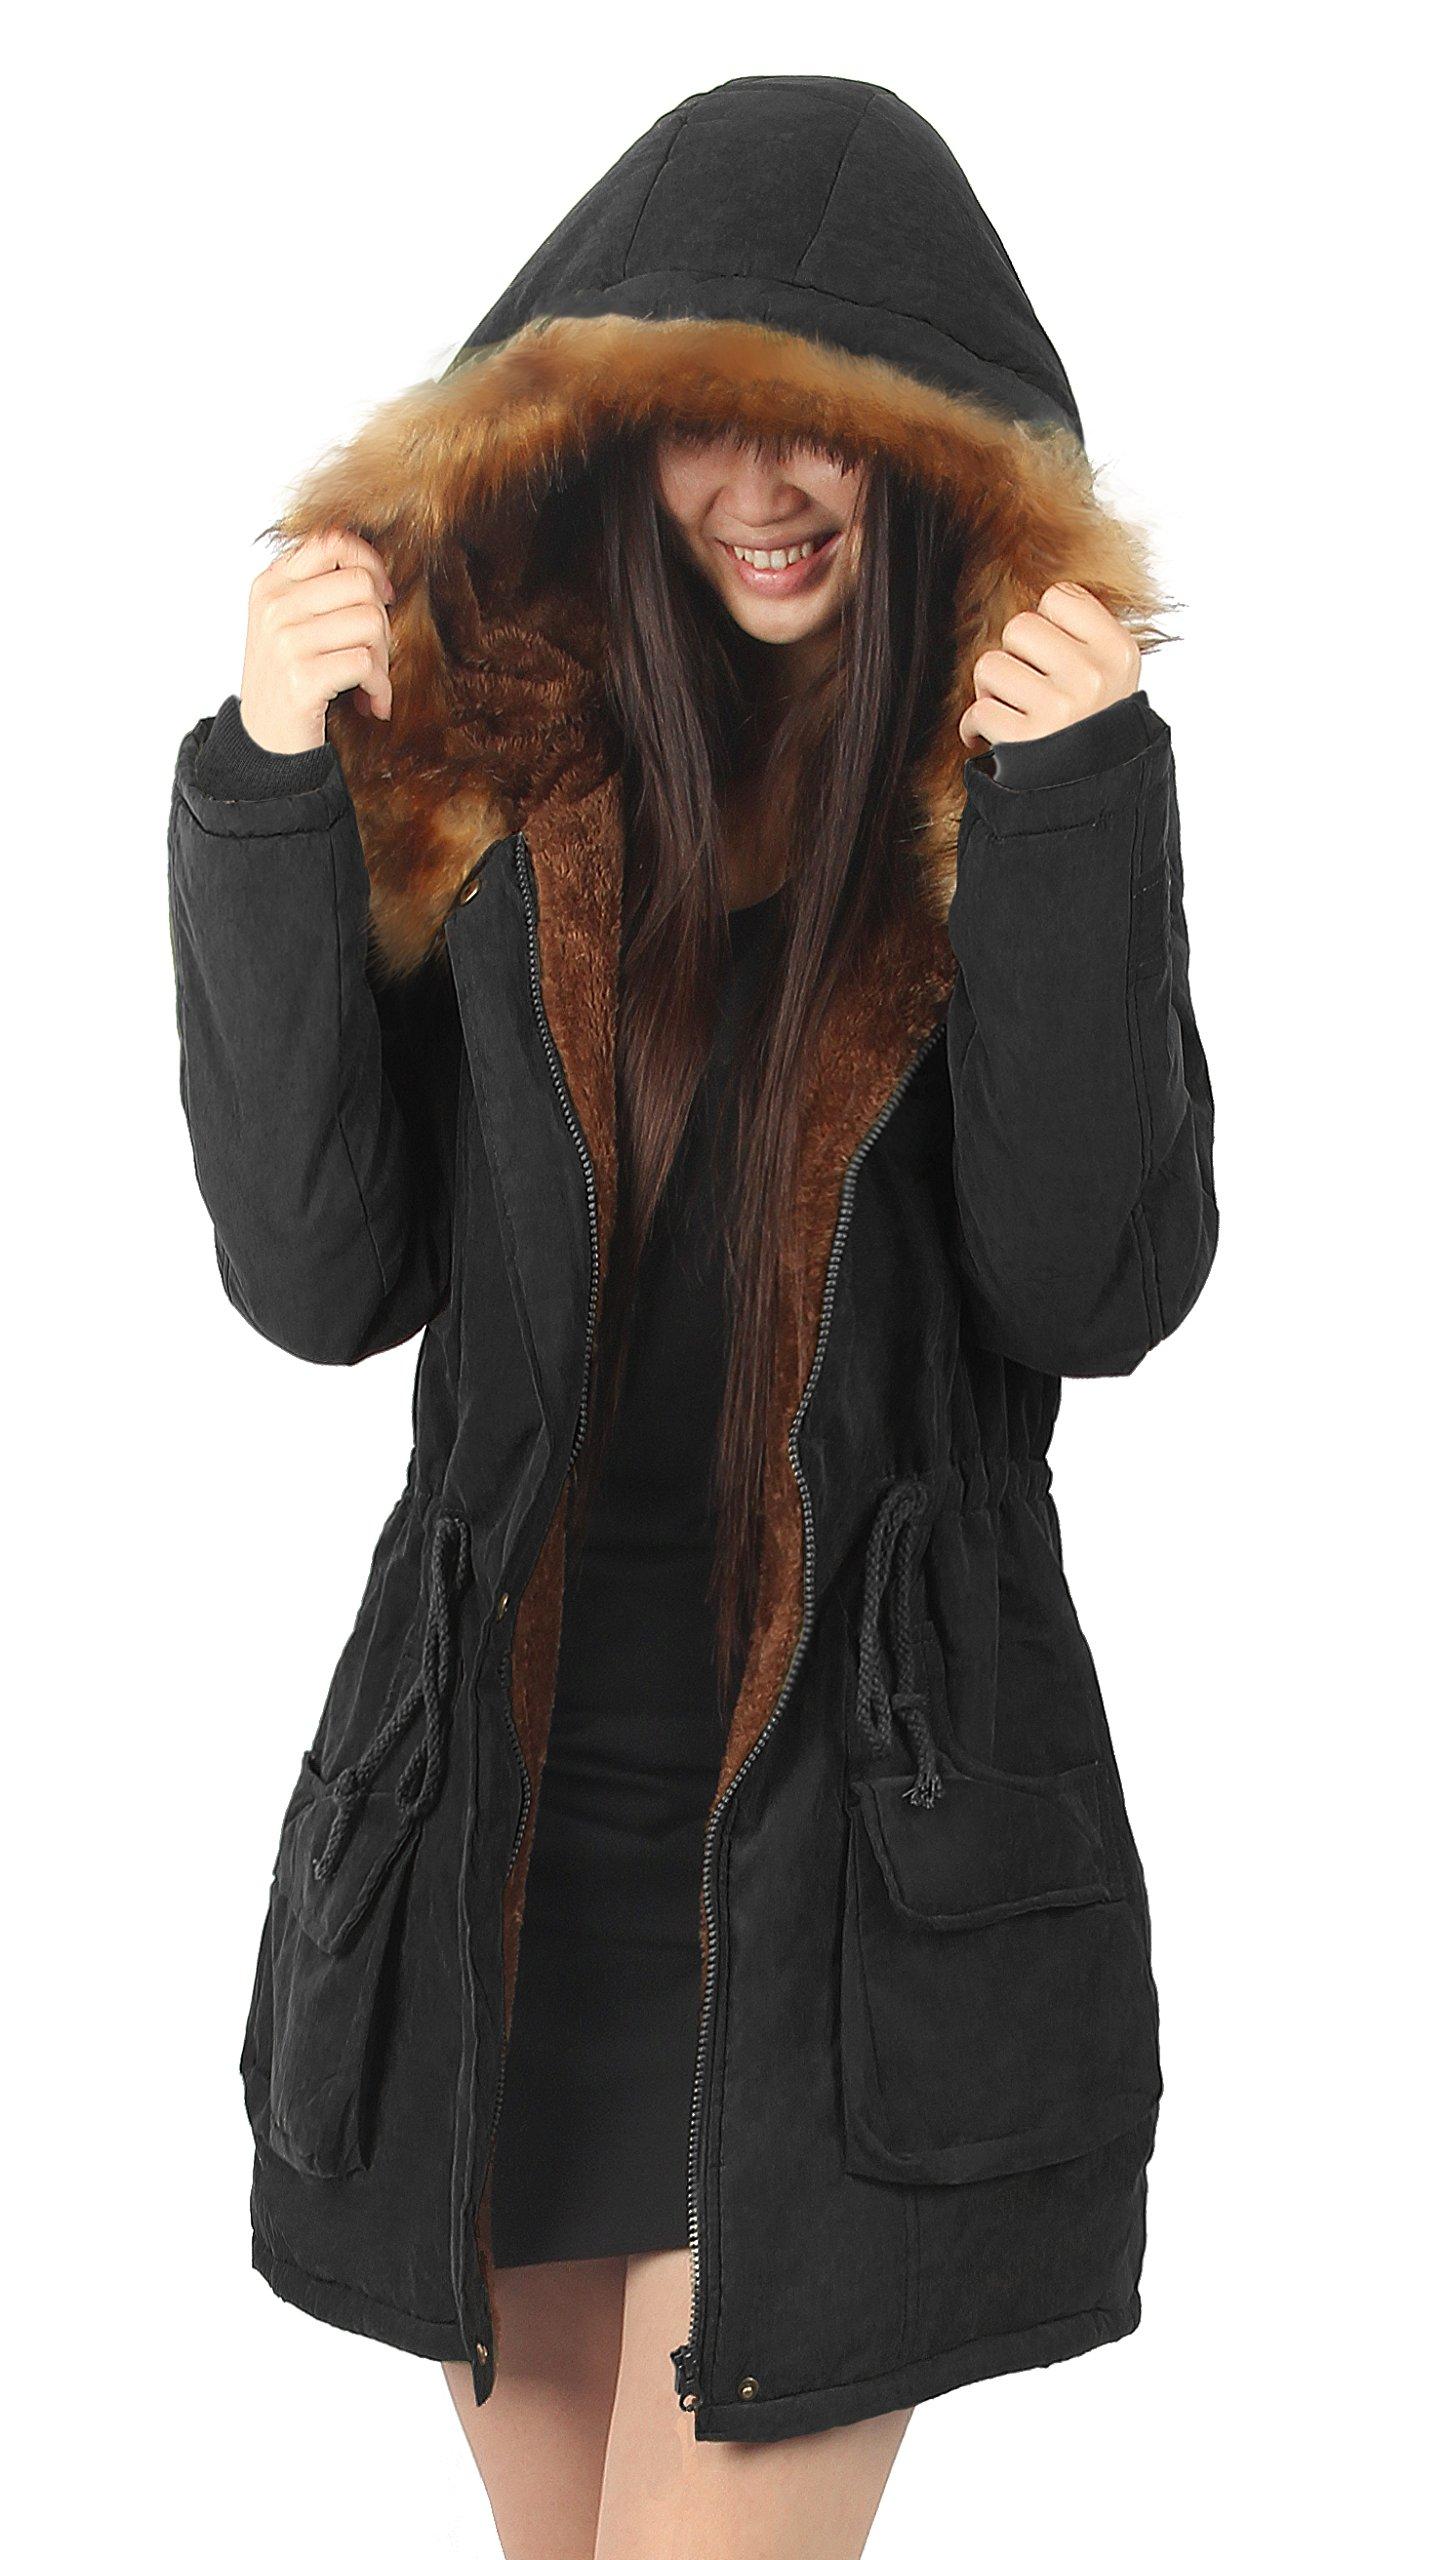 Coats B01855EIZY/